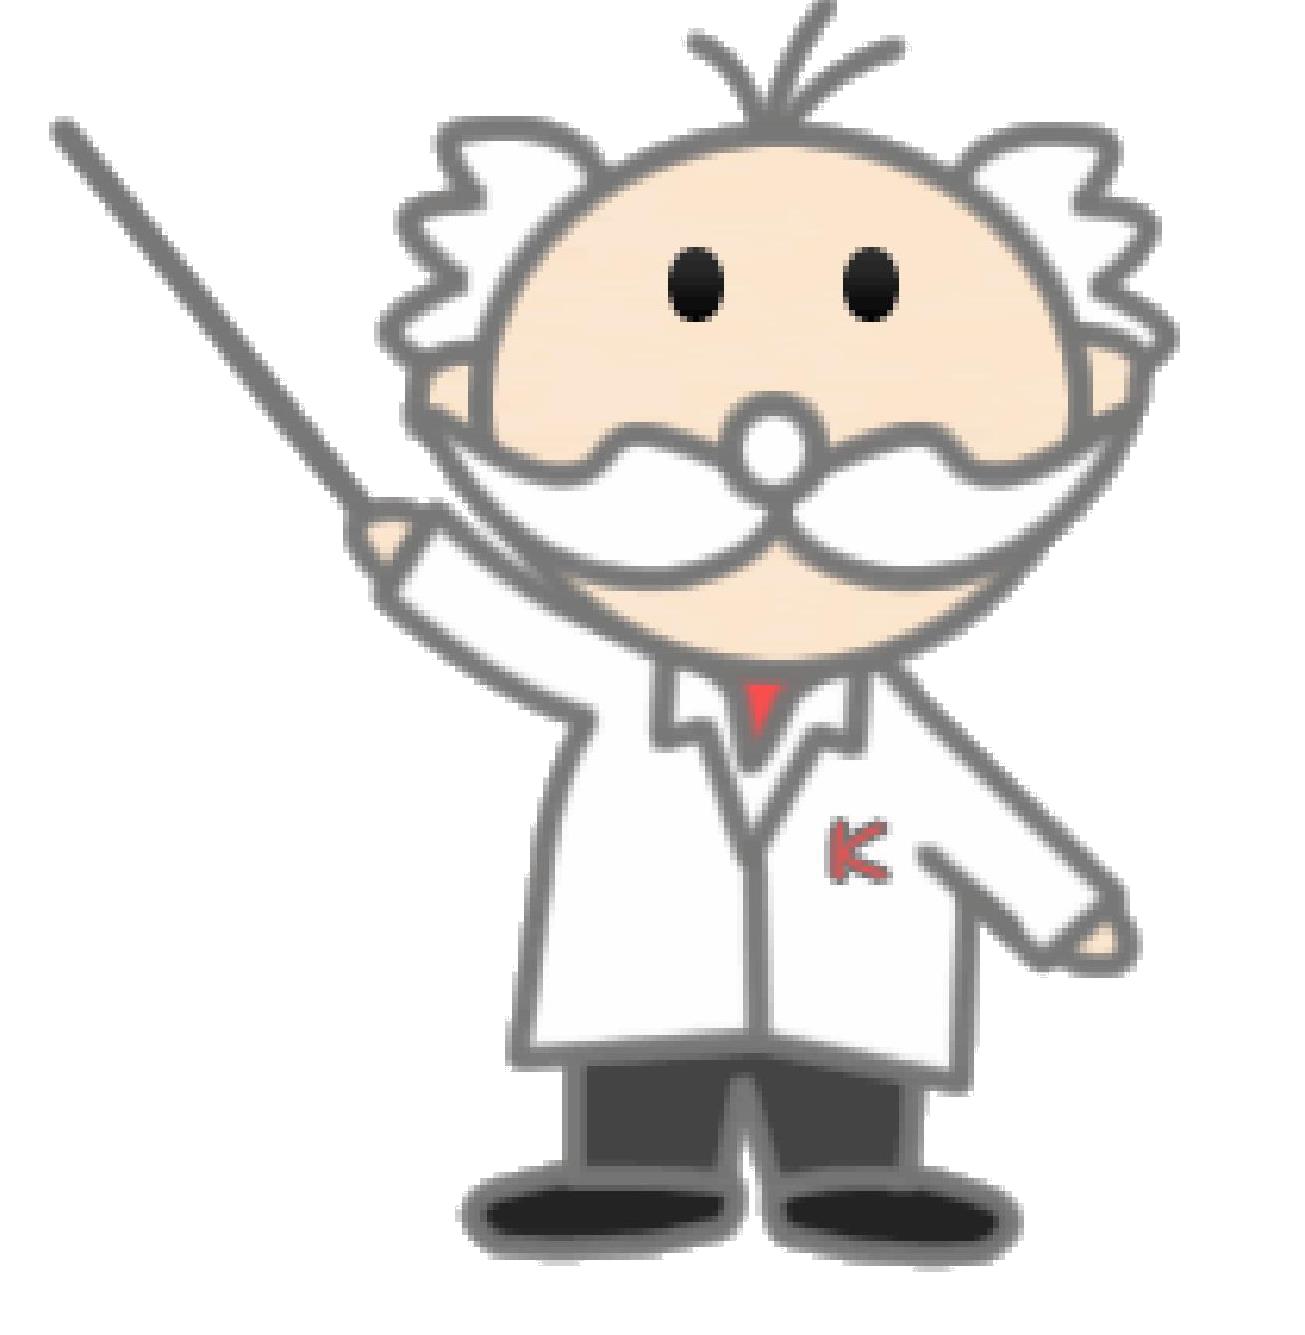 Kana博士0001 - コピー (2)